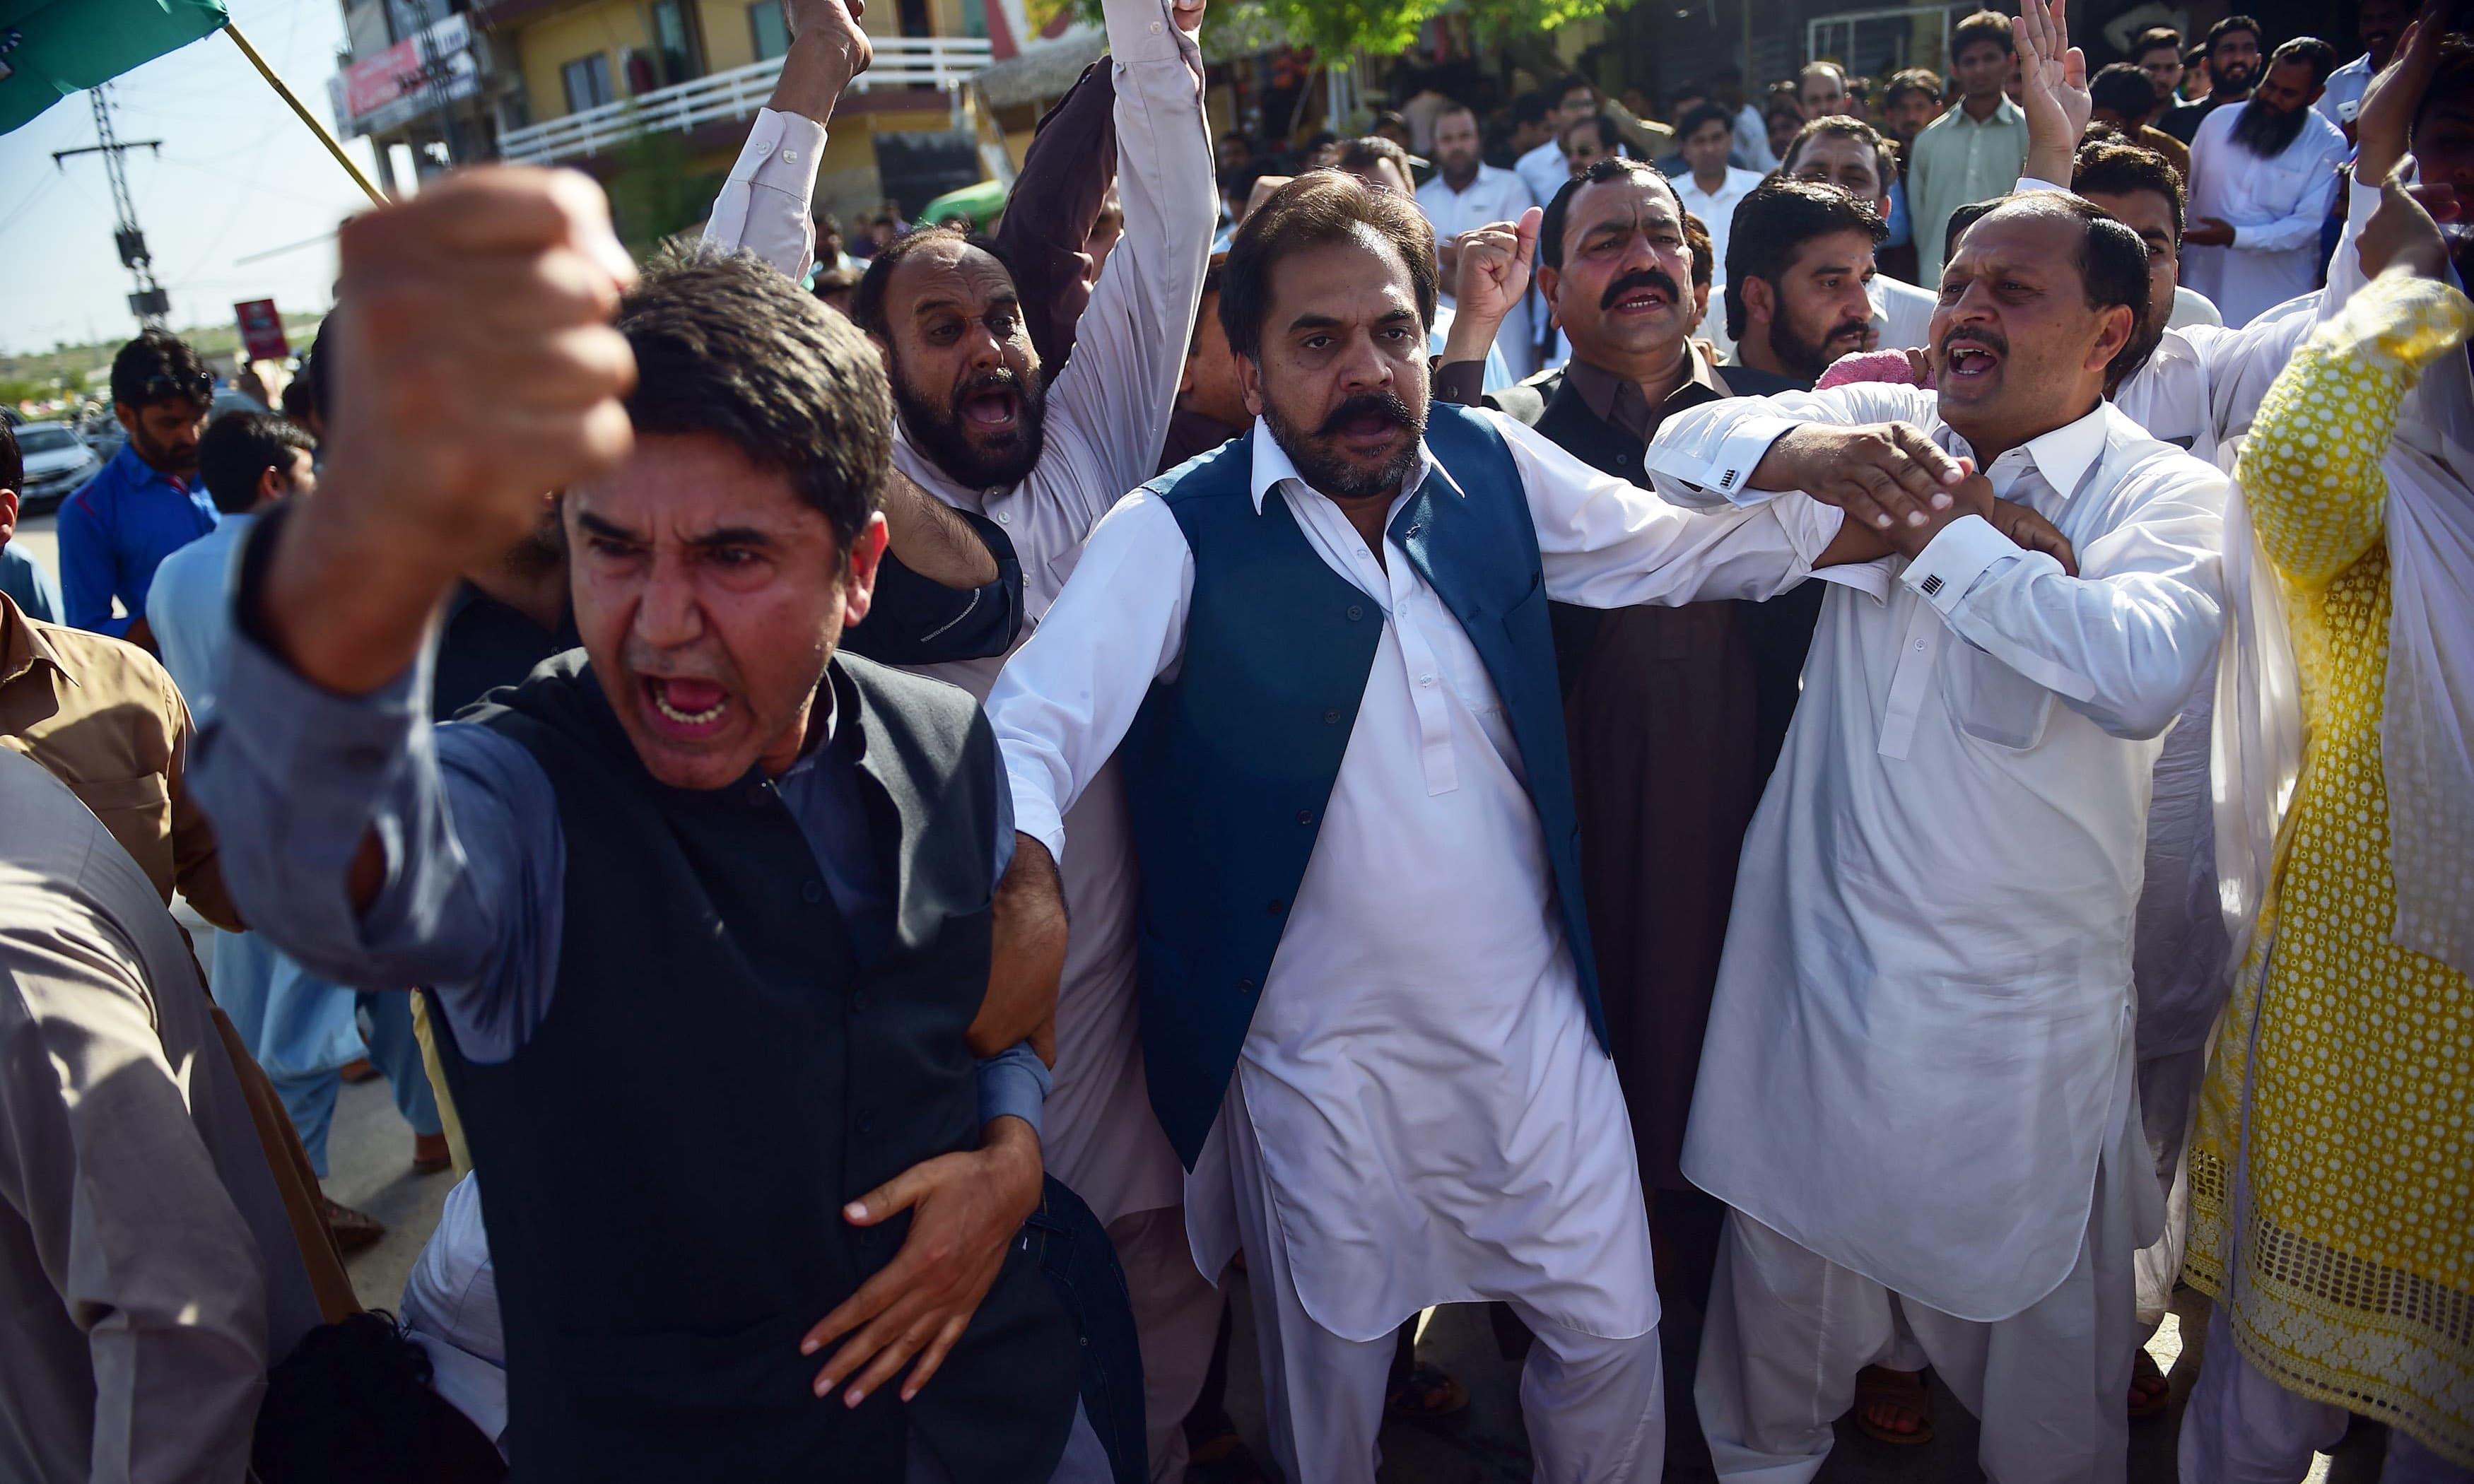 PML-N activists shout slogans outside court after the sentencing of former prime minister Nawaz Sharif in Islamabad. —AFP